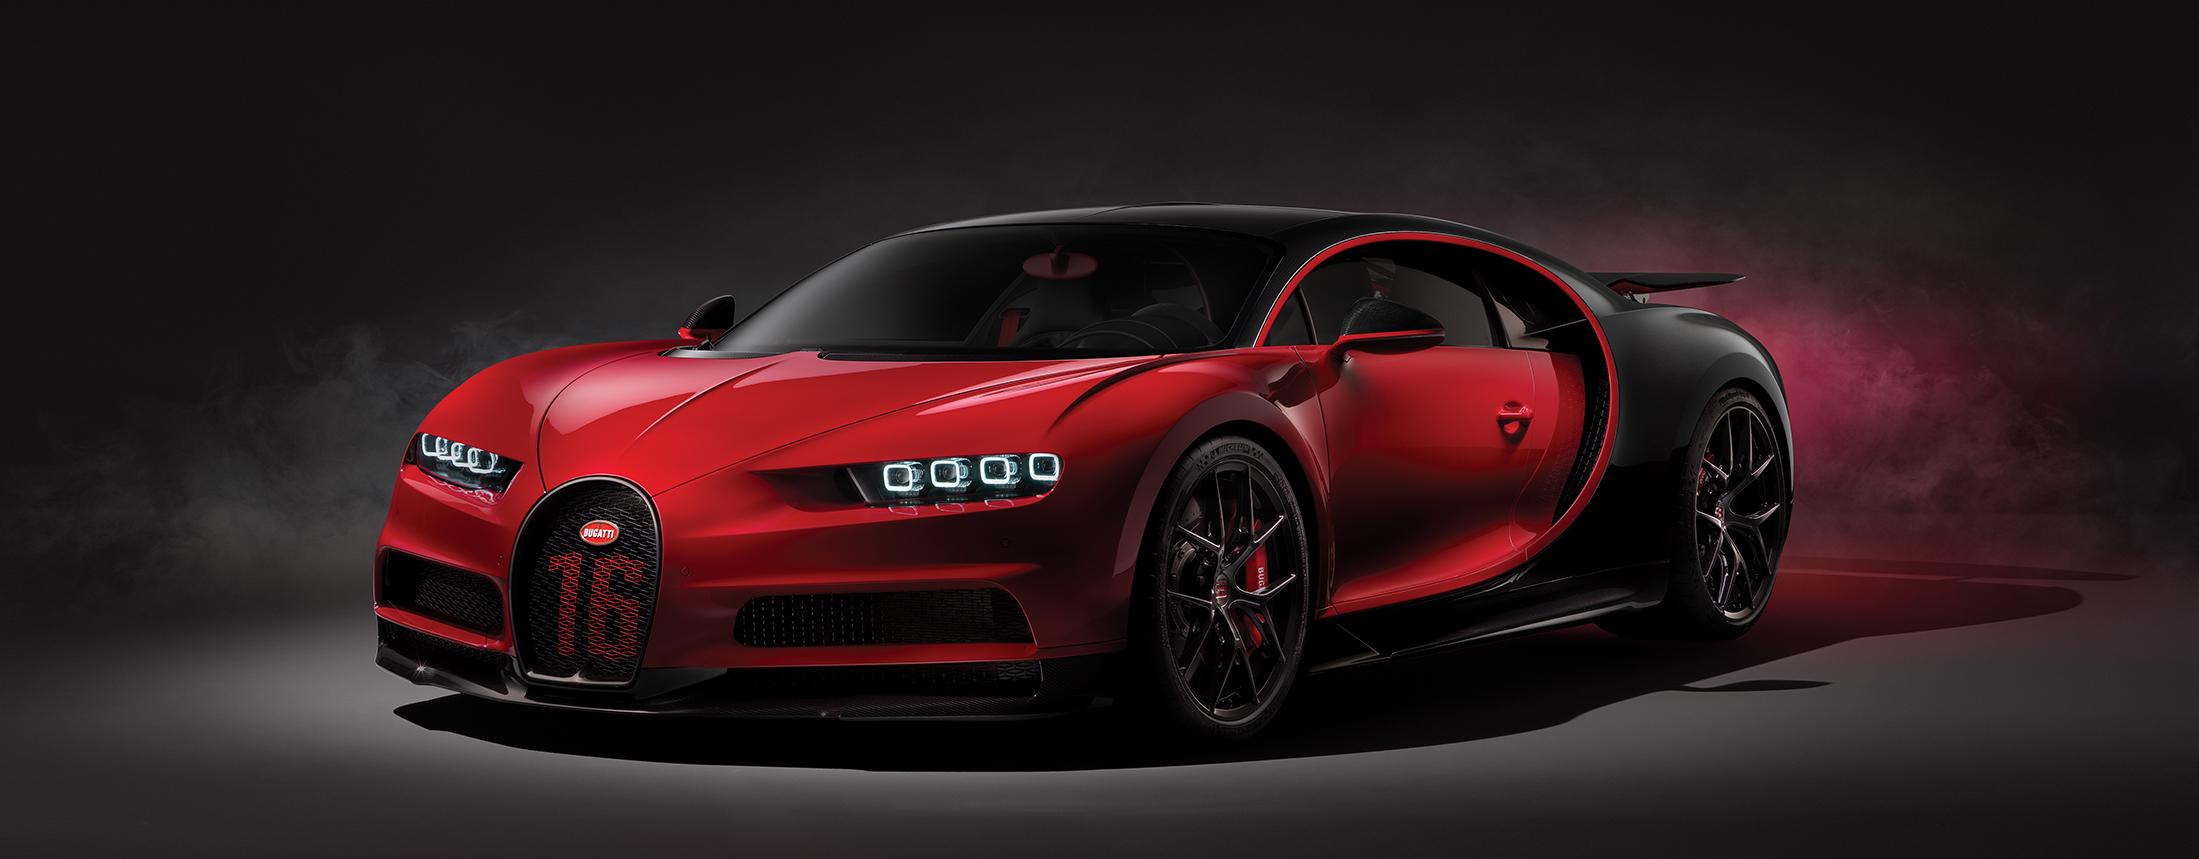 TrackWorthy - Bugatti Chiron Sport (2)